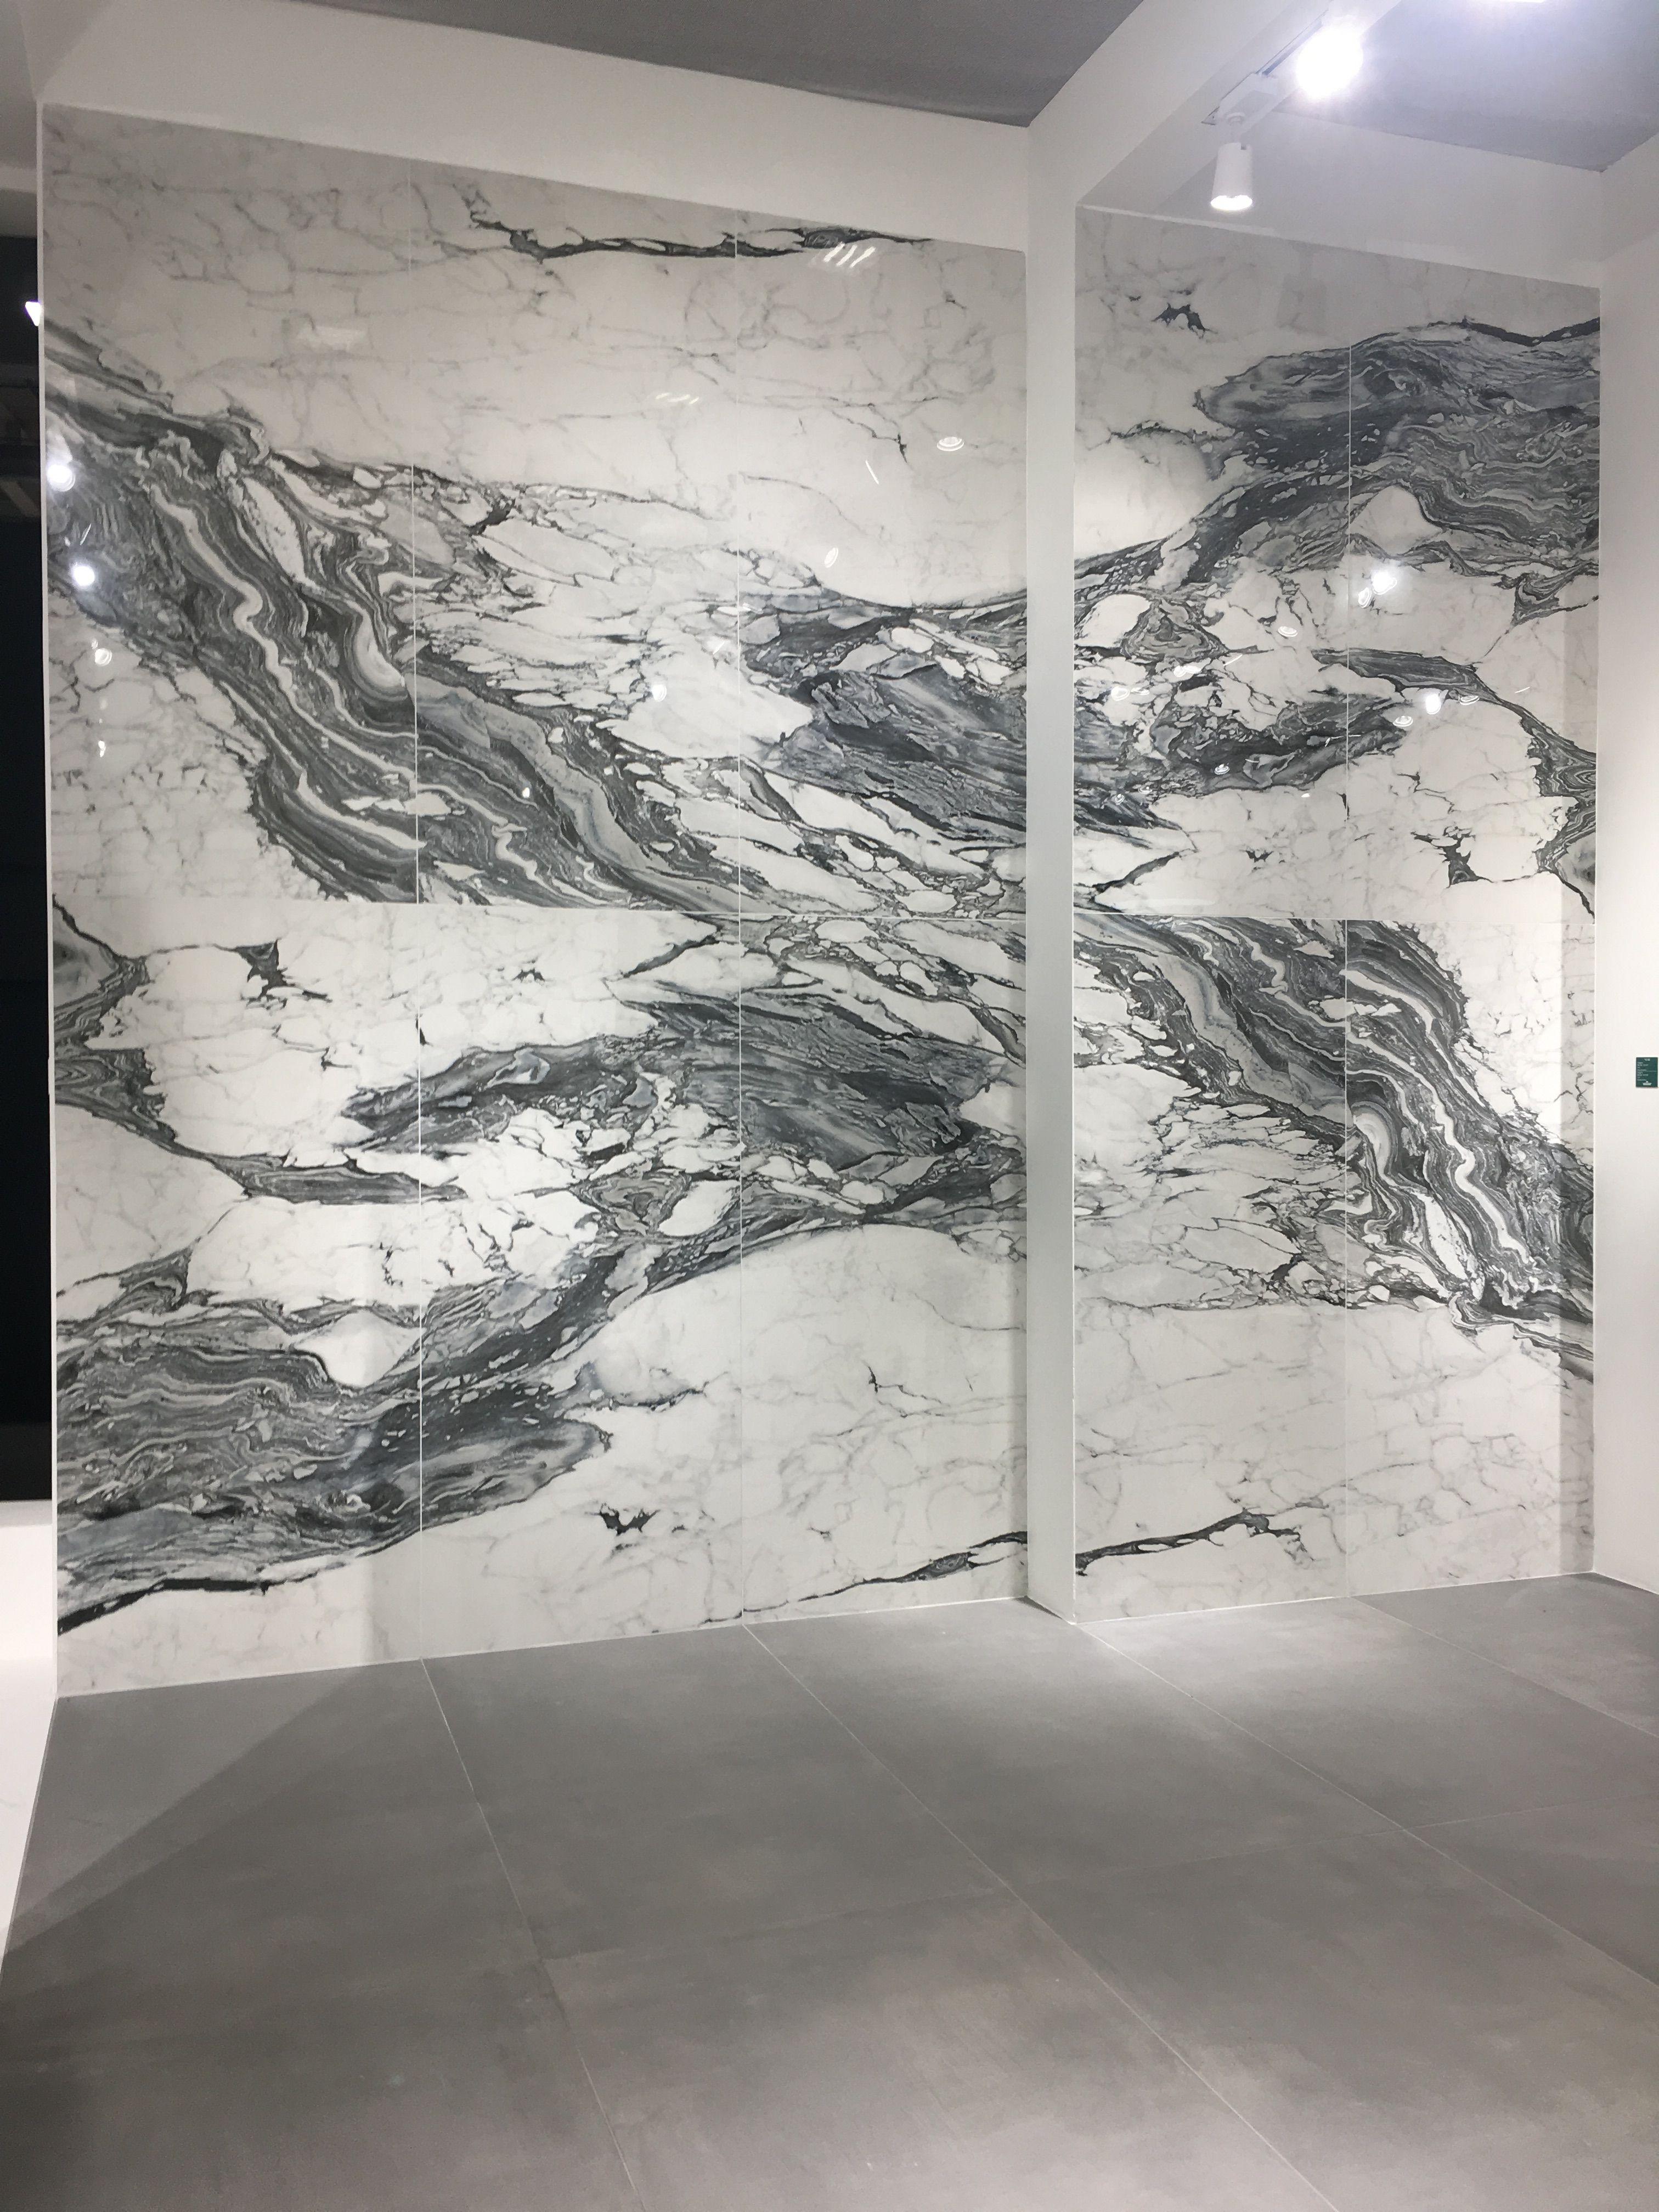 Carrelage To Be Renoir De Cercom Carrelage Imitation Marbre Marvel Tiles At Cersaie Bologna 2017 Abstract Artwork Tiles Wall Tiles